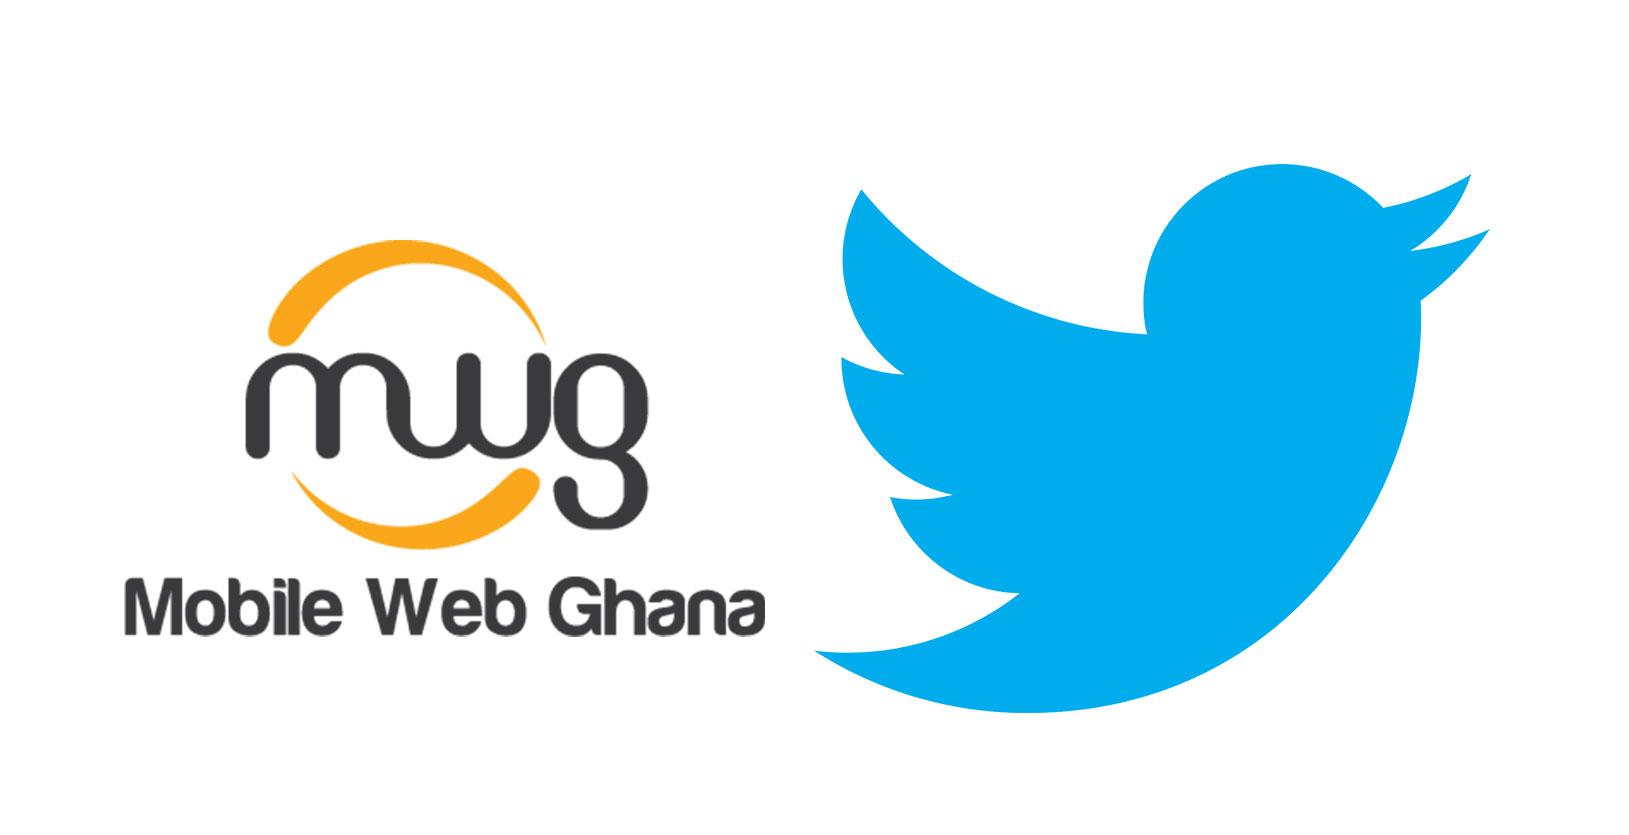 1-mobile-web-ghana